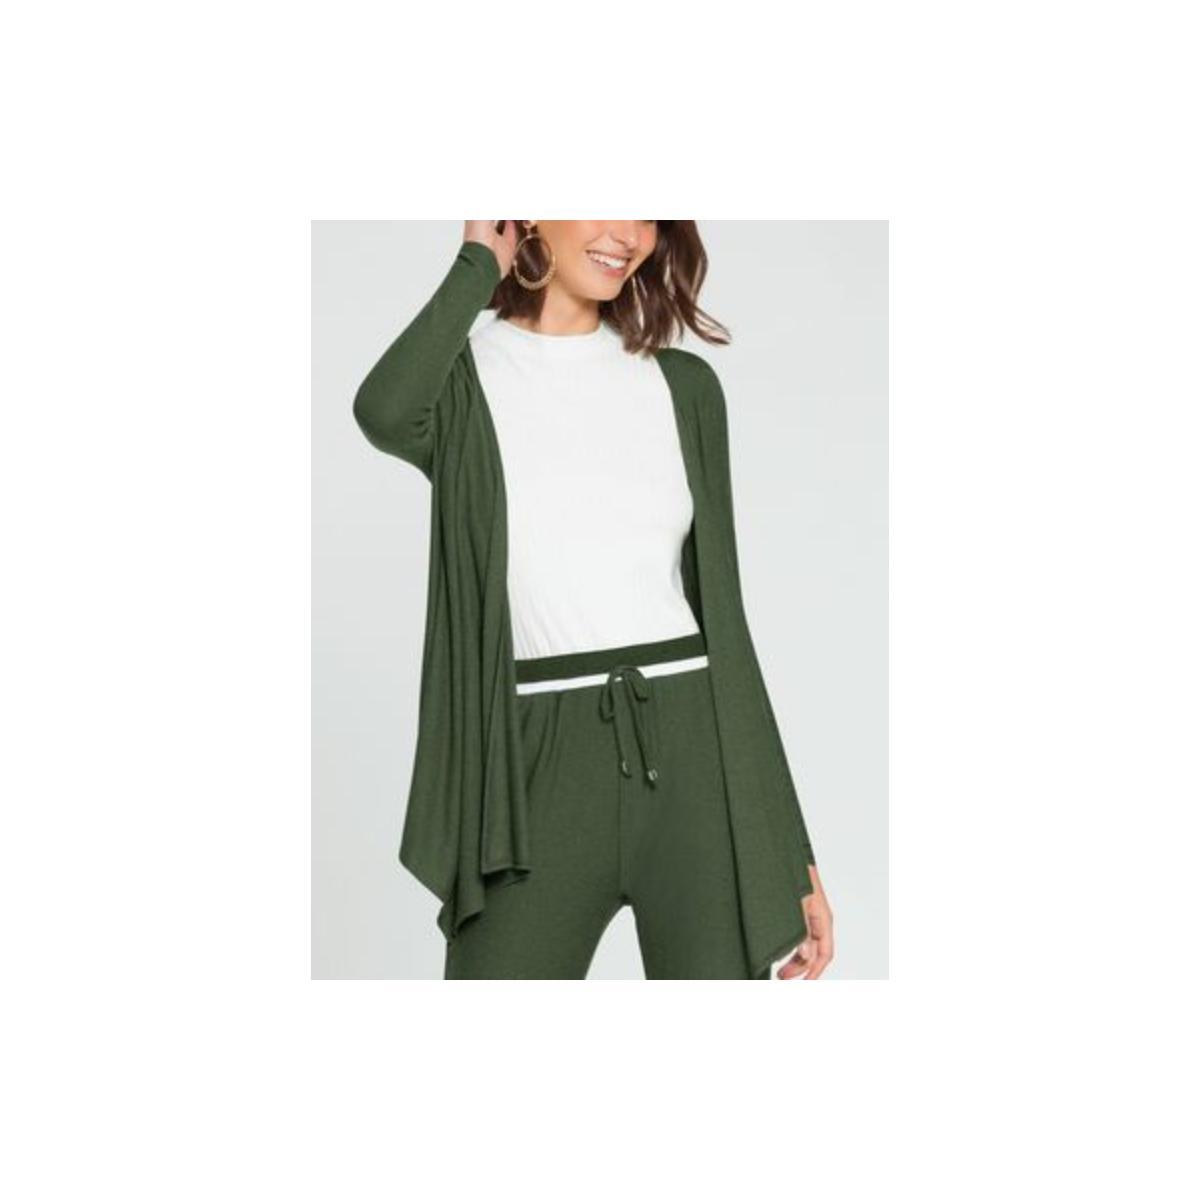 Cardigan Feminino Lunender 60129 Verde